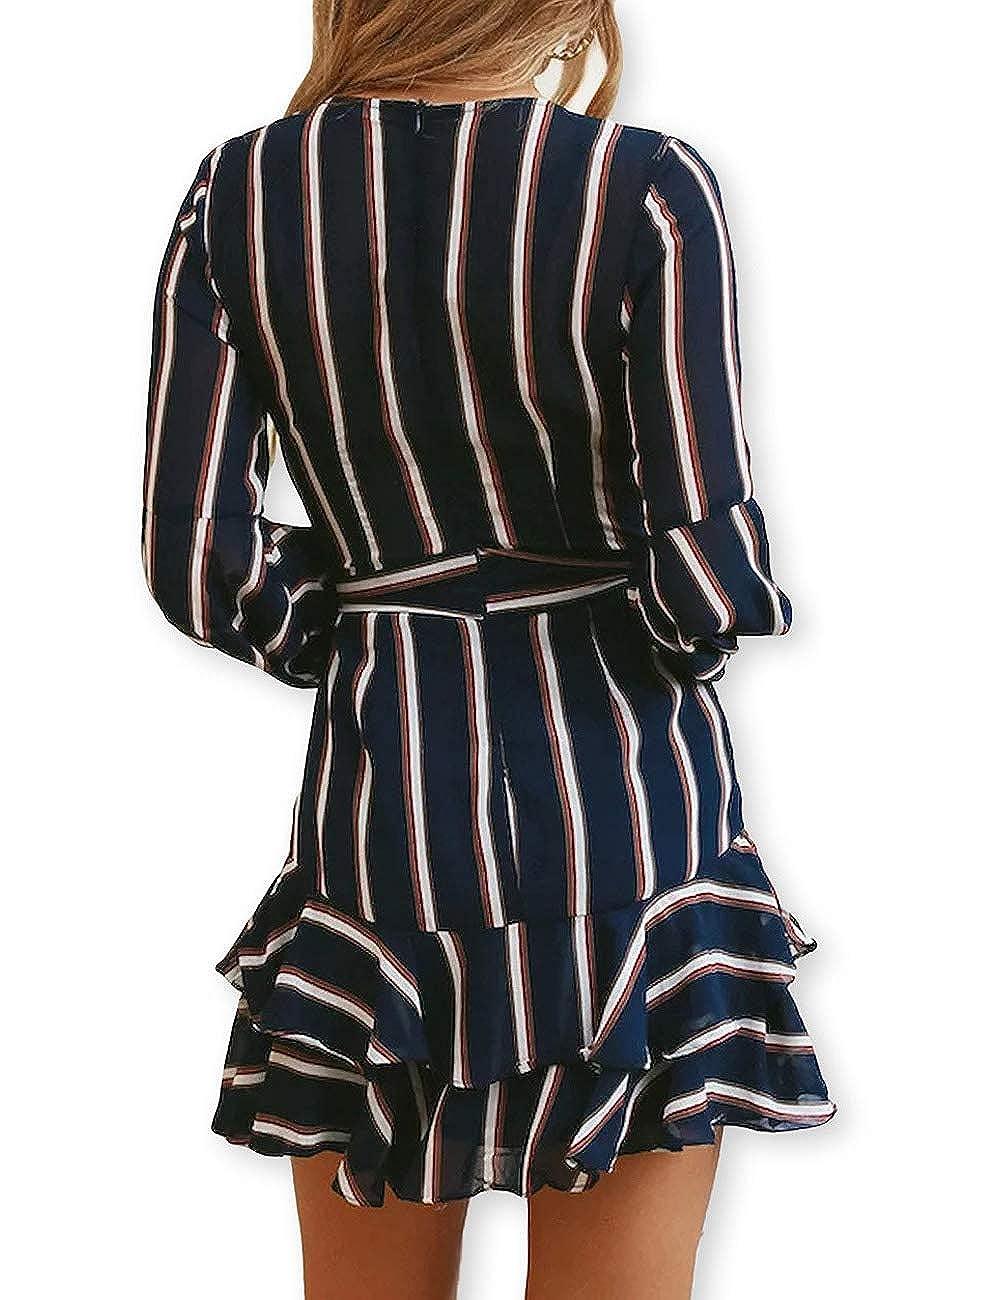 abce501b4d AOOKSMERY Women Sexy Strips Ruffles V-Neck Long Sleeve Empire Waist Short  Dress with Belt at Amazon Women s Clothing store